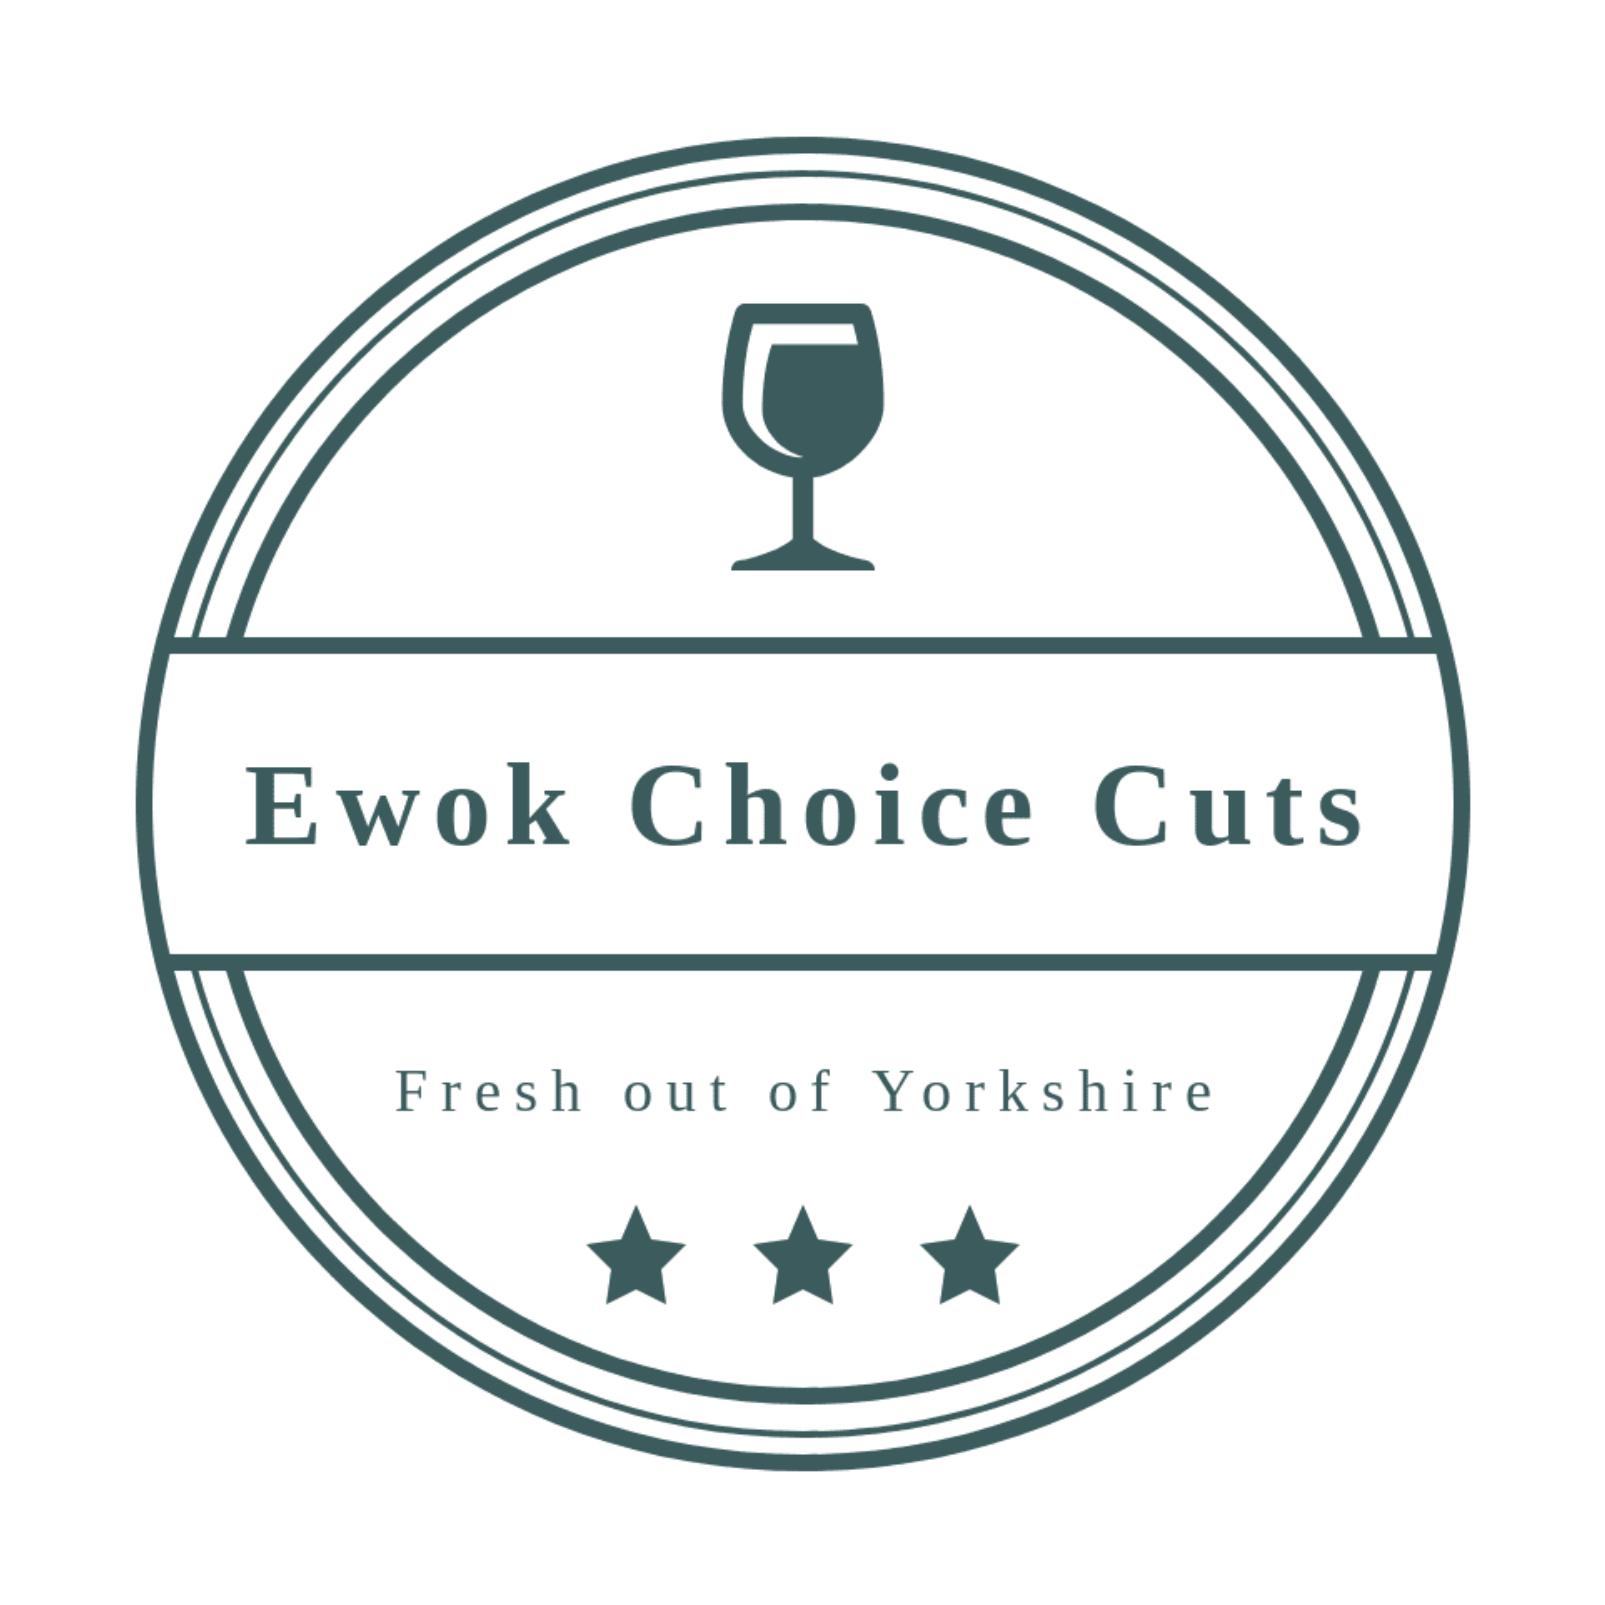 Image of Ewok Choice Cuts